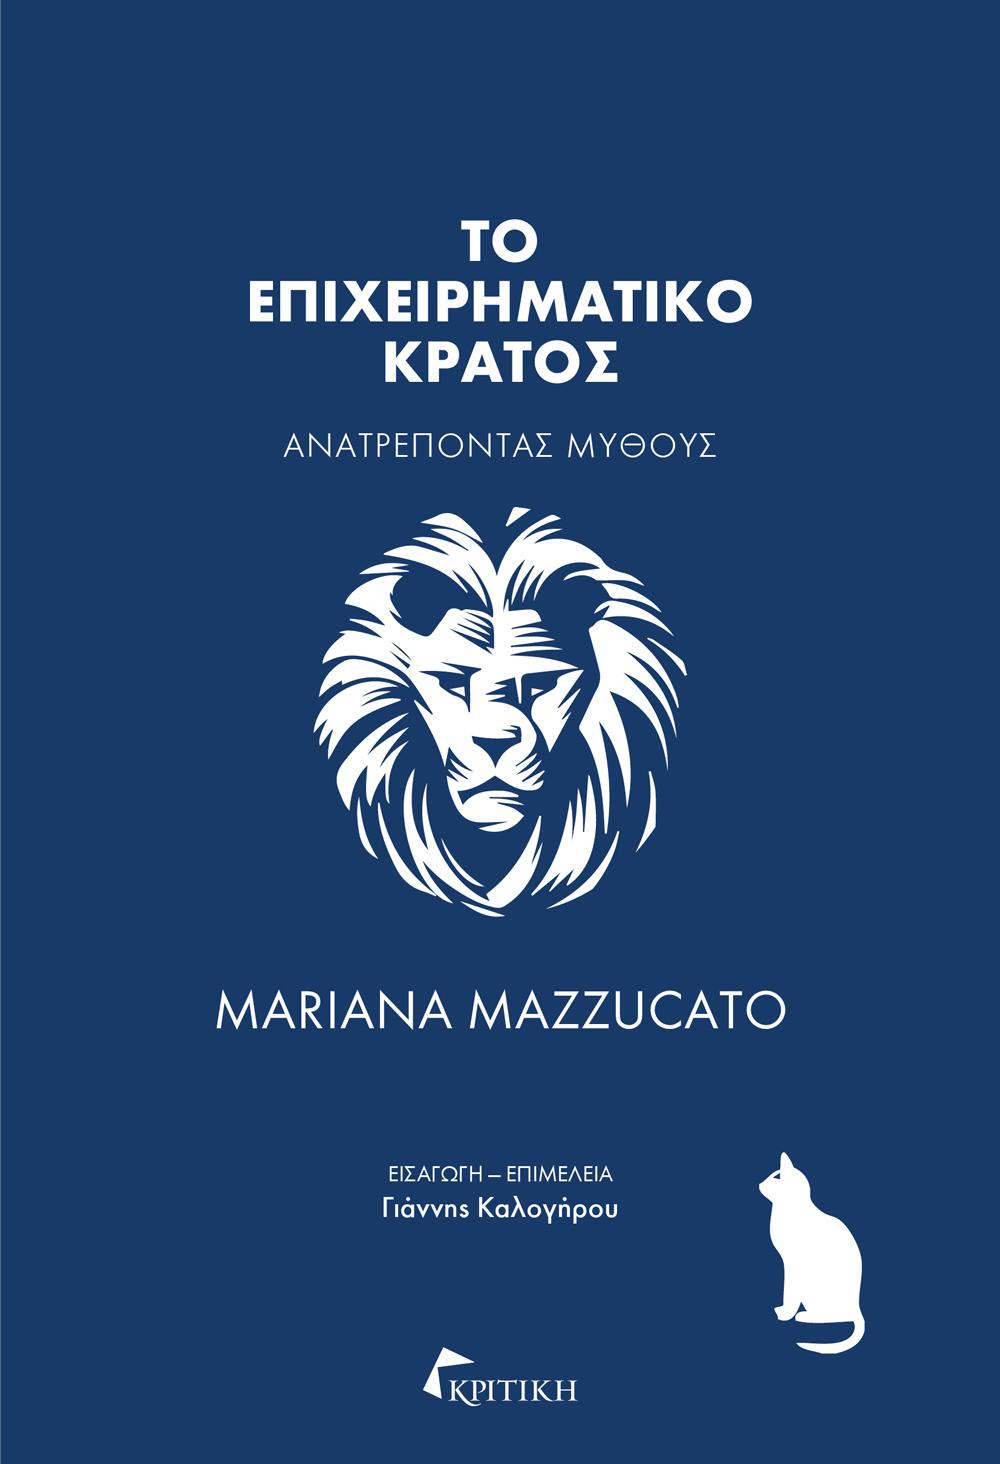 Mariana Mazzucato: Η Ελλάδα να κάνει ό,τι κάνει η Γερμανία, όχι ό,τι λέει